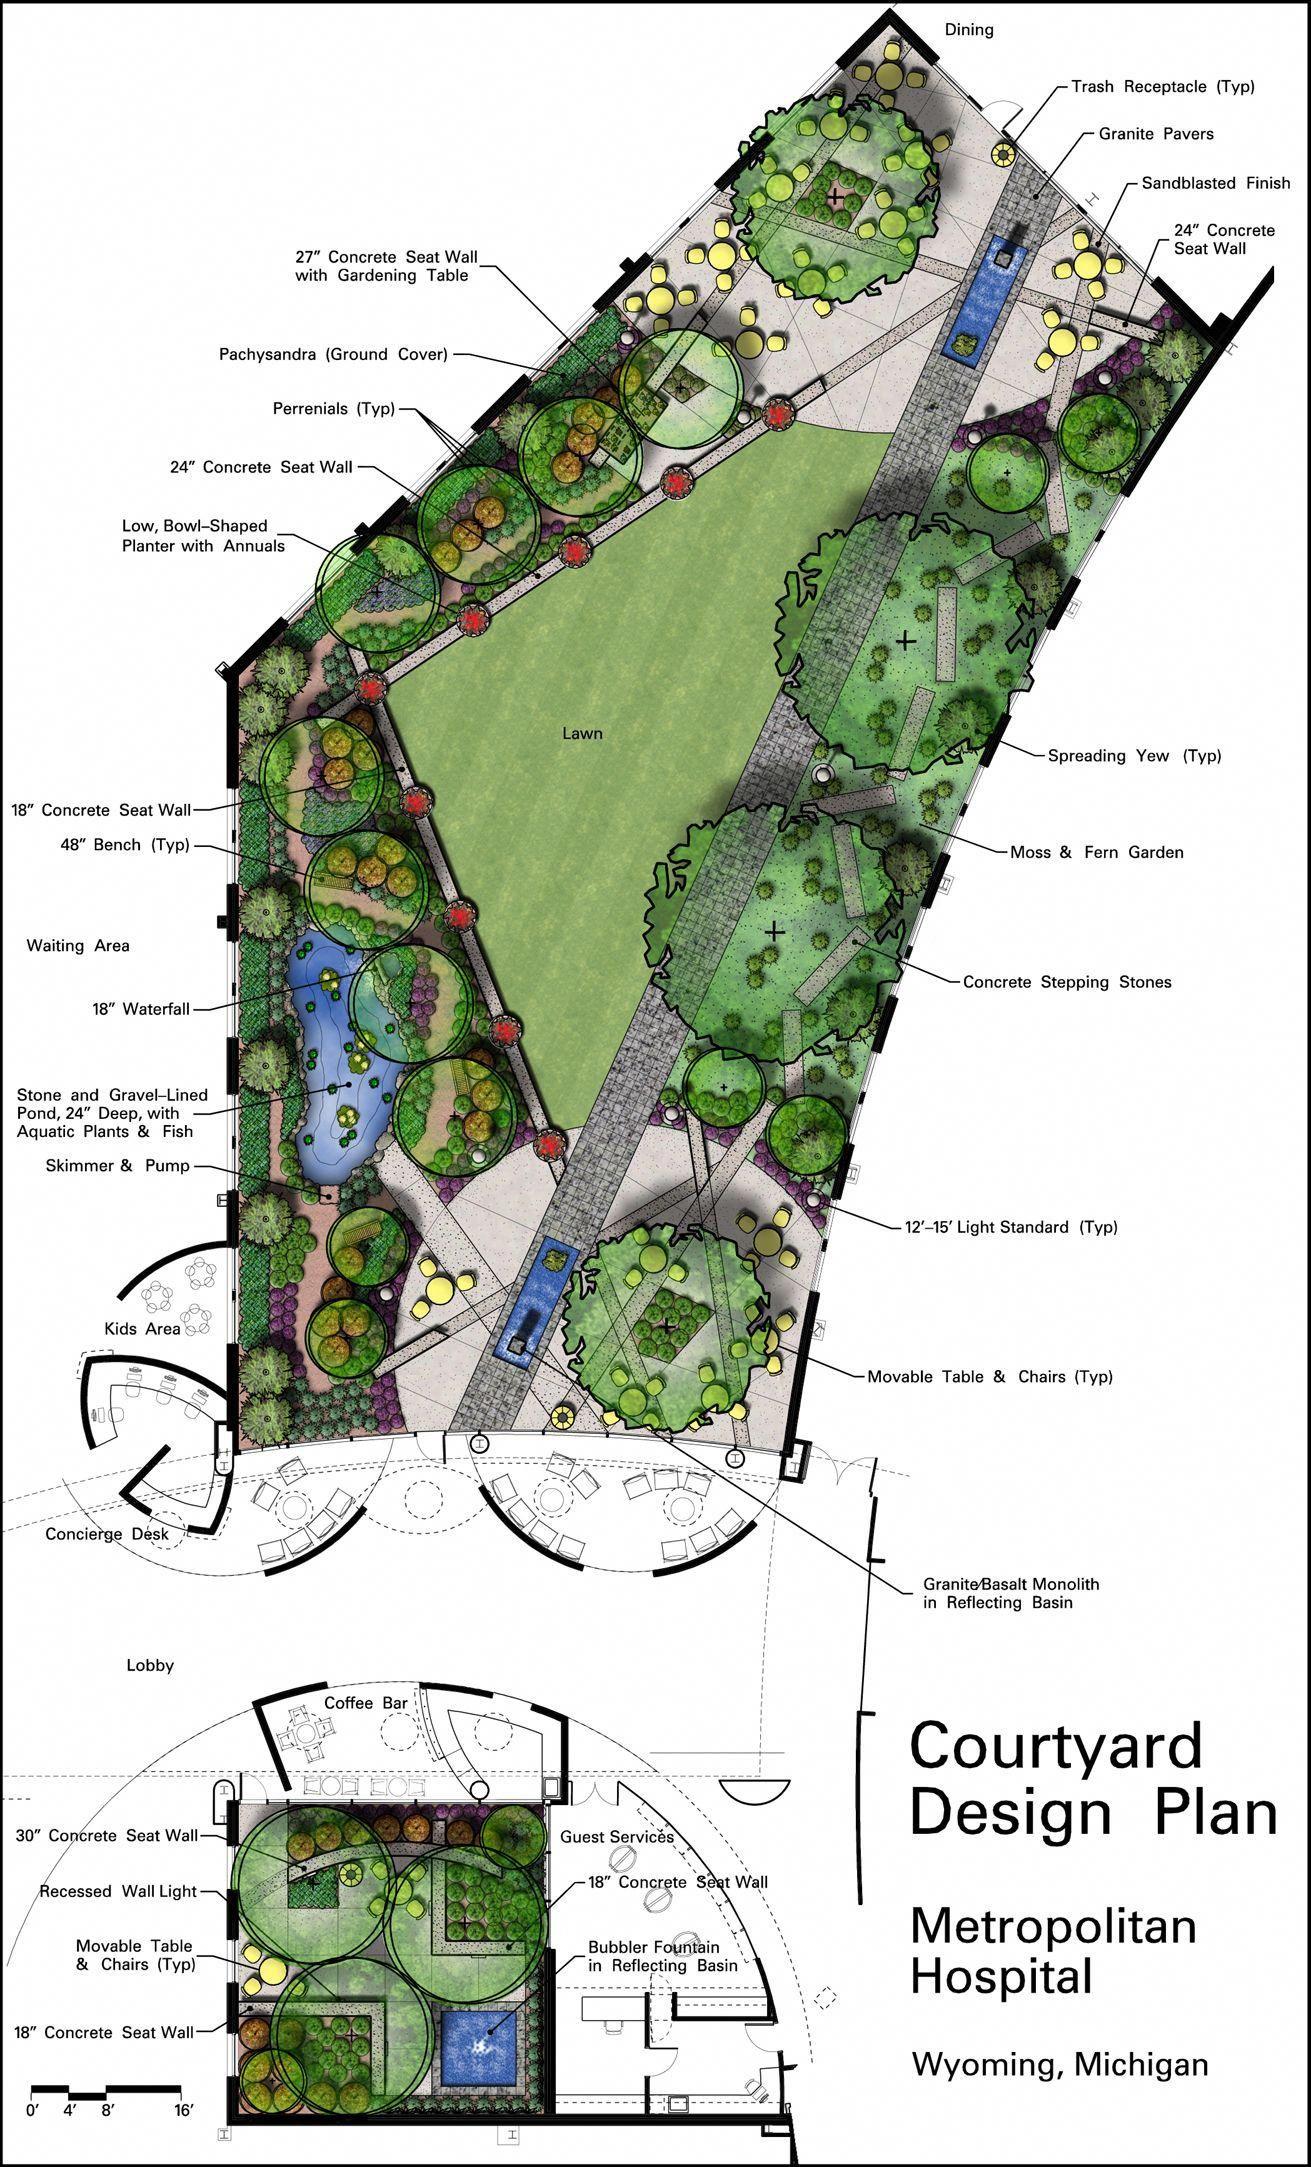 Landscape Gardening Design Ideas Landscape Architectural Graphic Standards Pdf Free Download Courtyard Design Landscape Design Landscape Design Plans